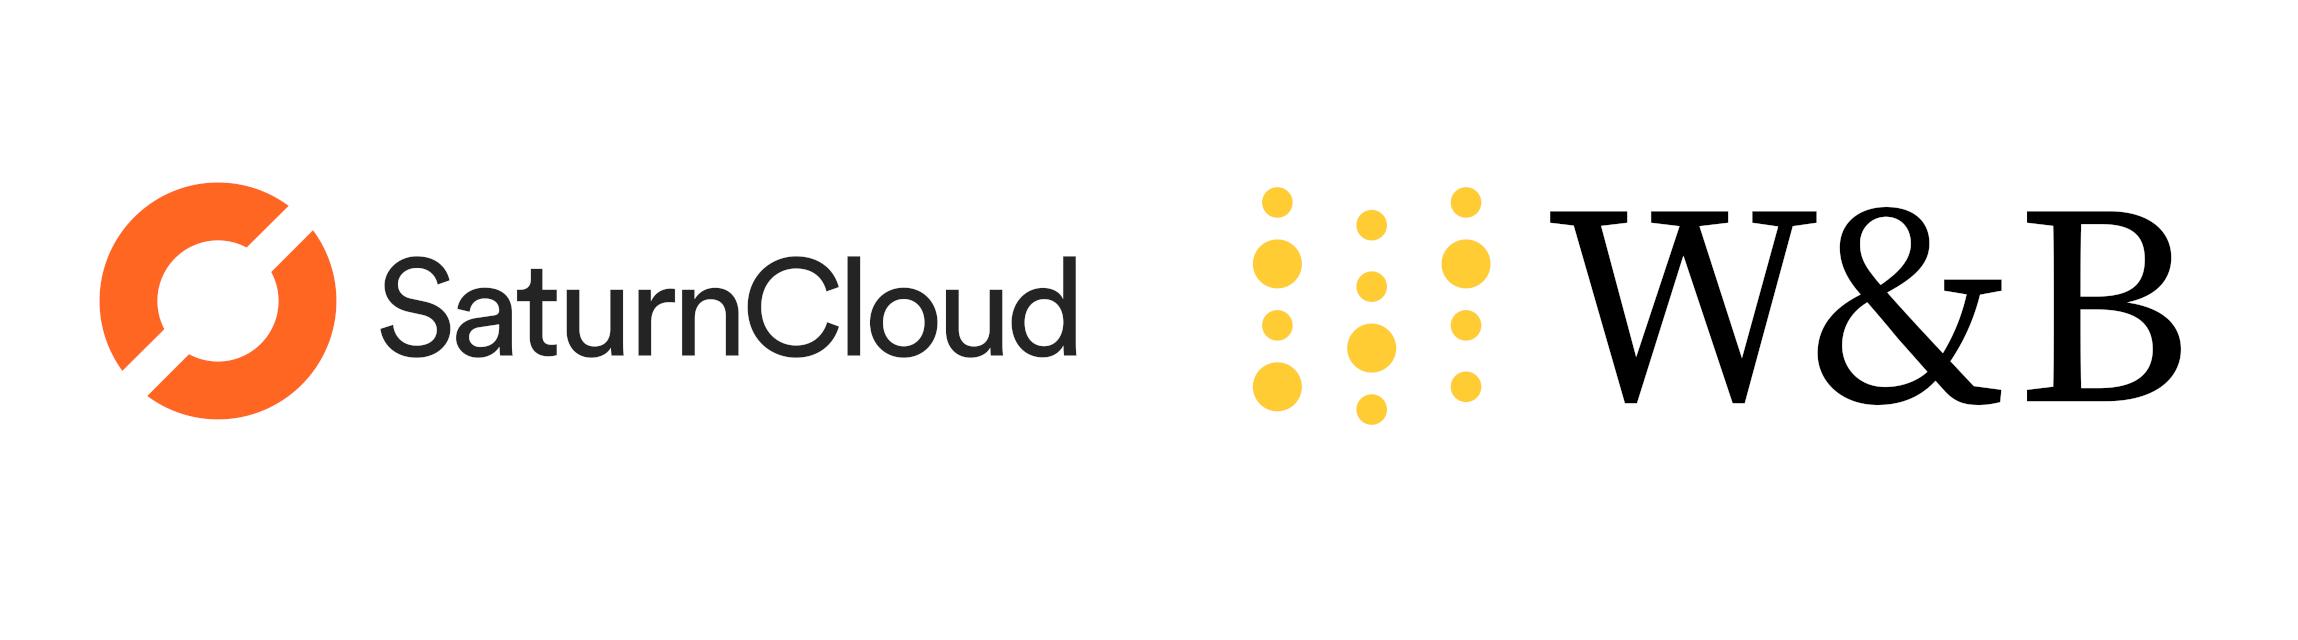 Saturn Cloud and Weights & Biases logos